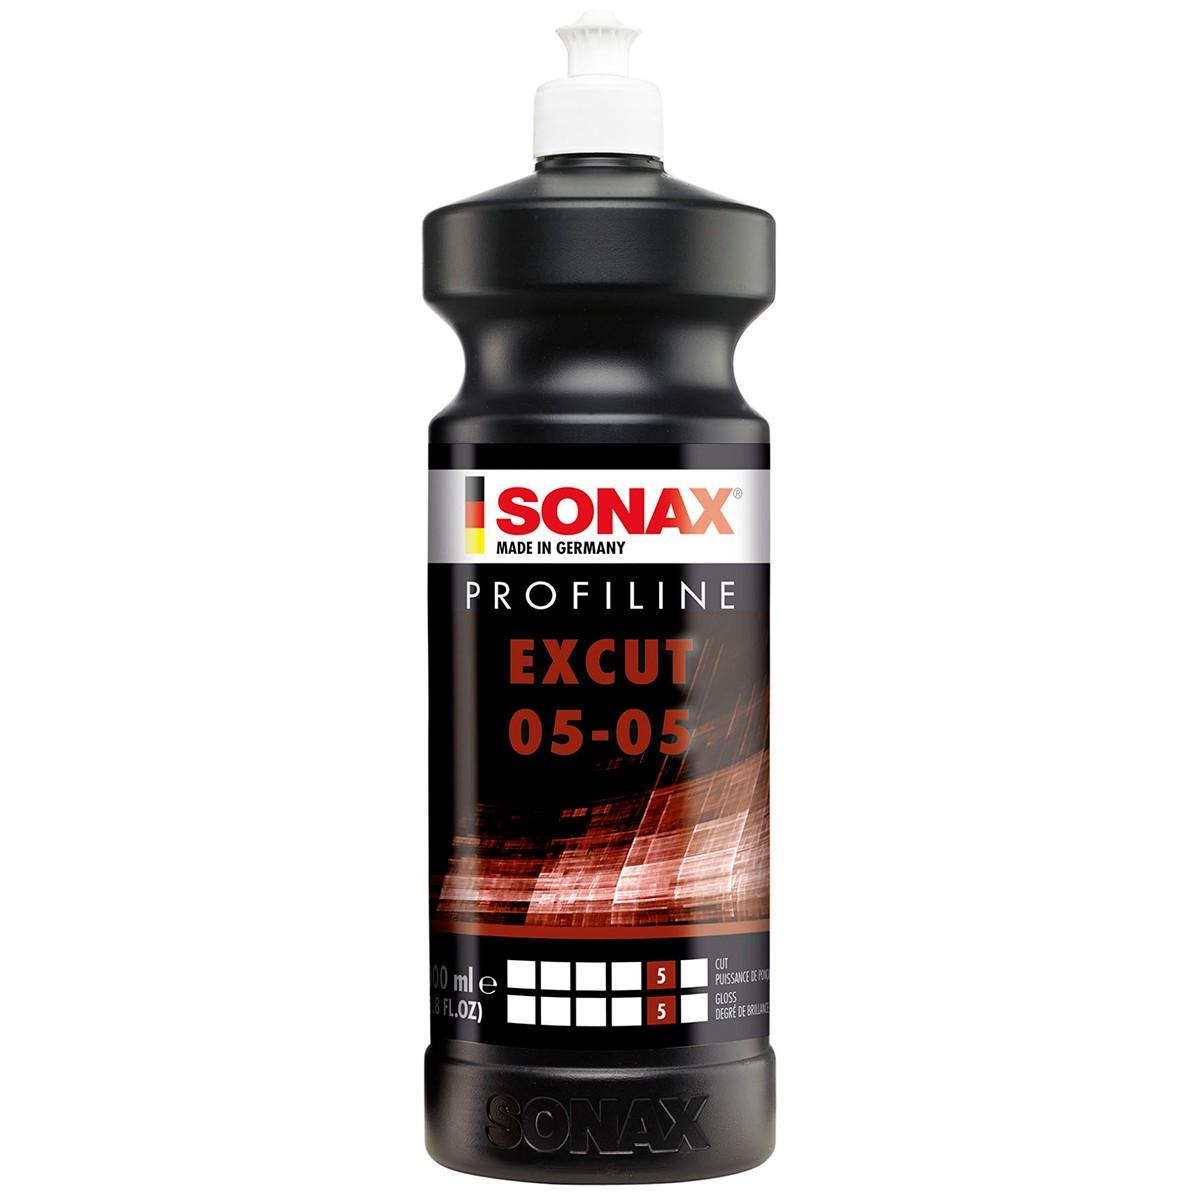 Composto Polidor ExCut 05-05 1lt - Sonax